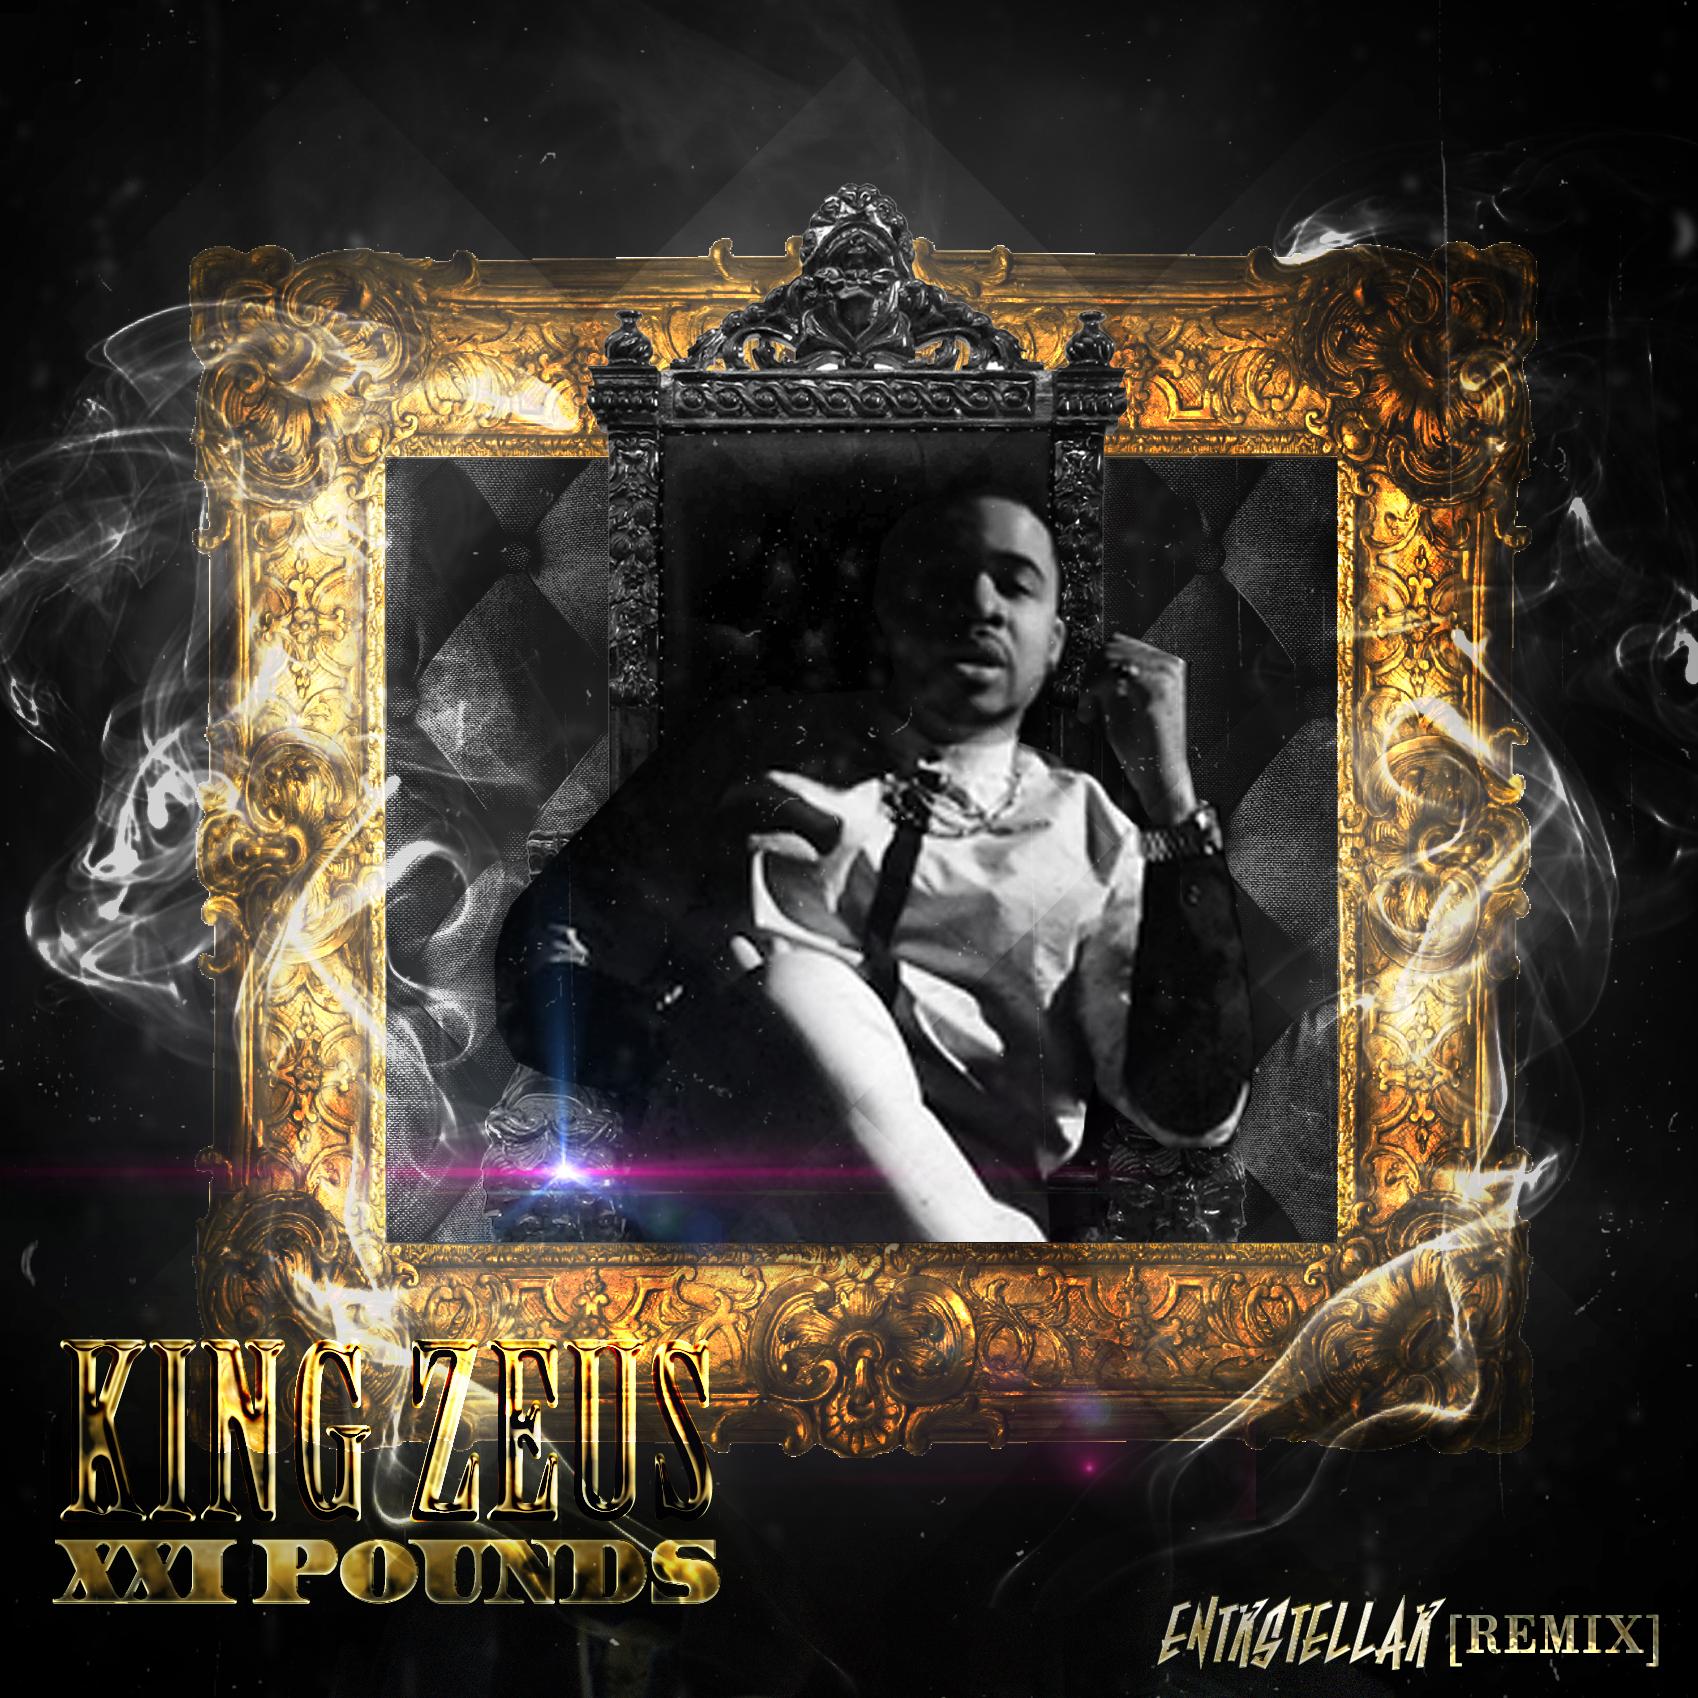 K!NG Z3US - 21 Pounds (ENTRSTELLAR REMIX) [Remix contest 2nd place]